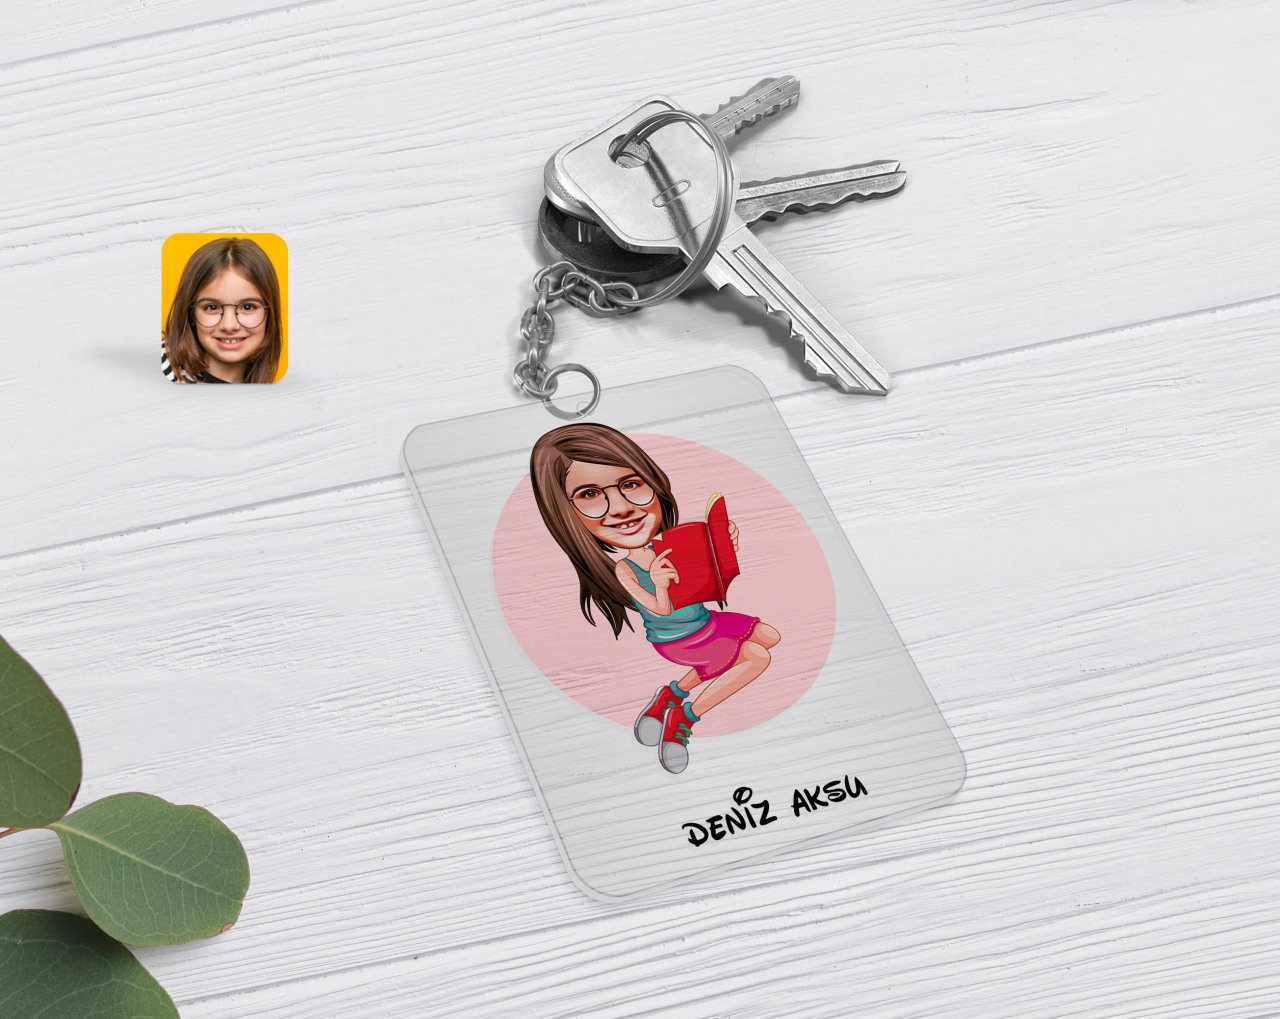 Anahtarlík-5-شخصية ، للأطفال والنساء ، من زجاج شبكي شفاف